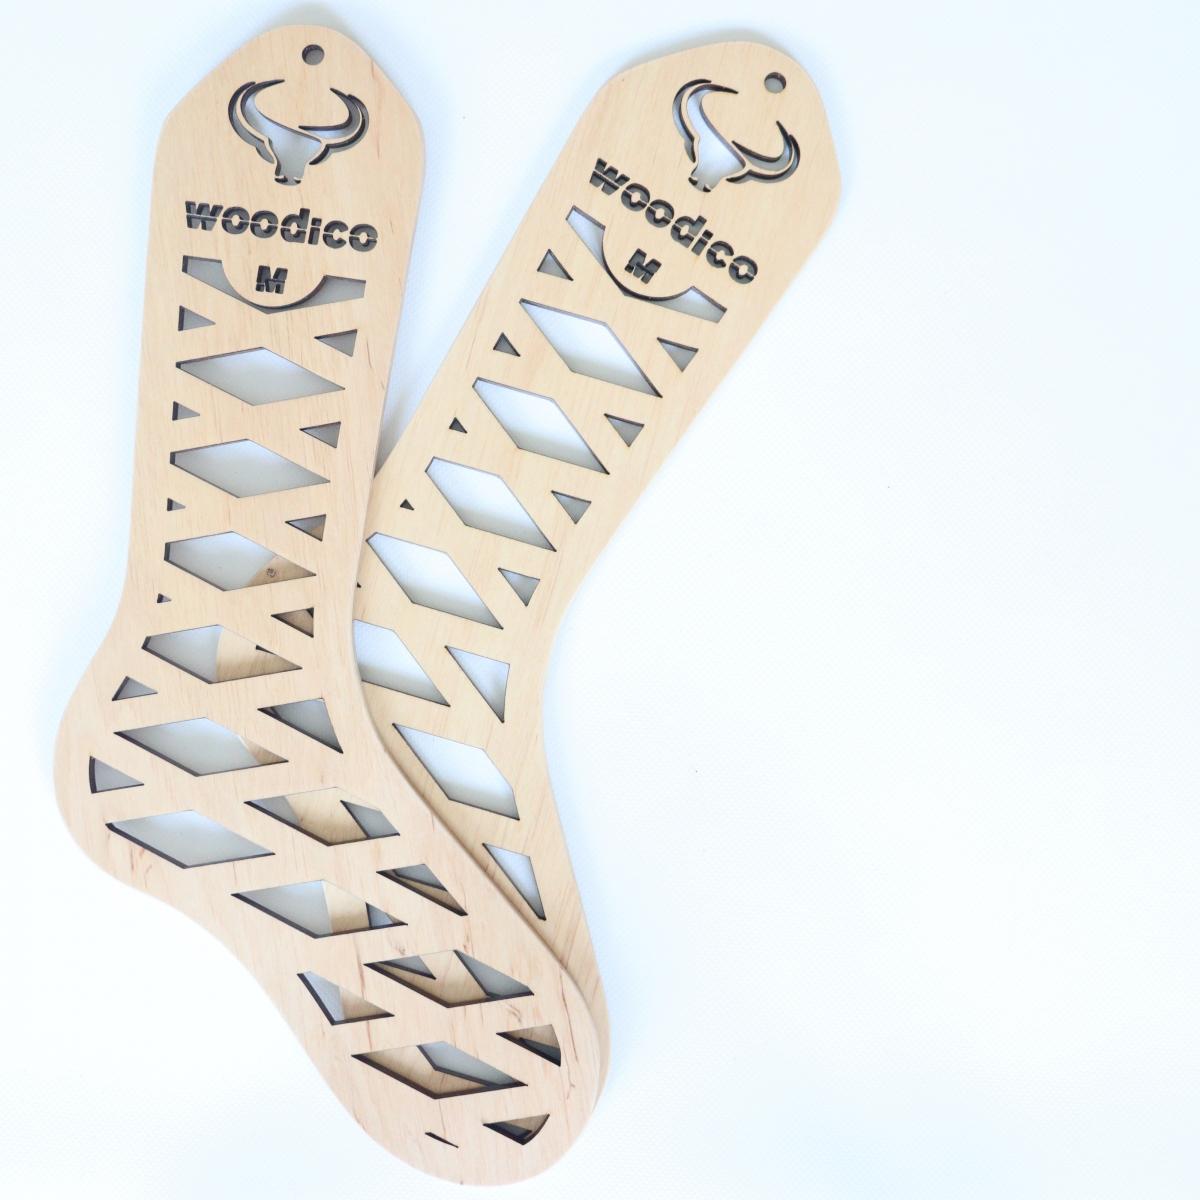 woodico.pro wooden sock blockers taurus 34 1200x1200 - Wooden sock blockers / Taurus